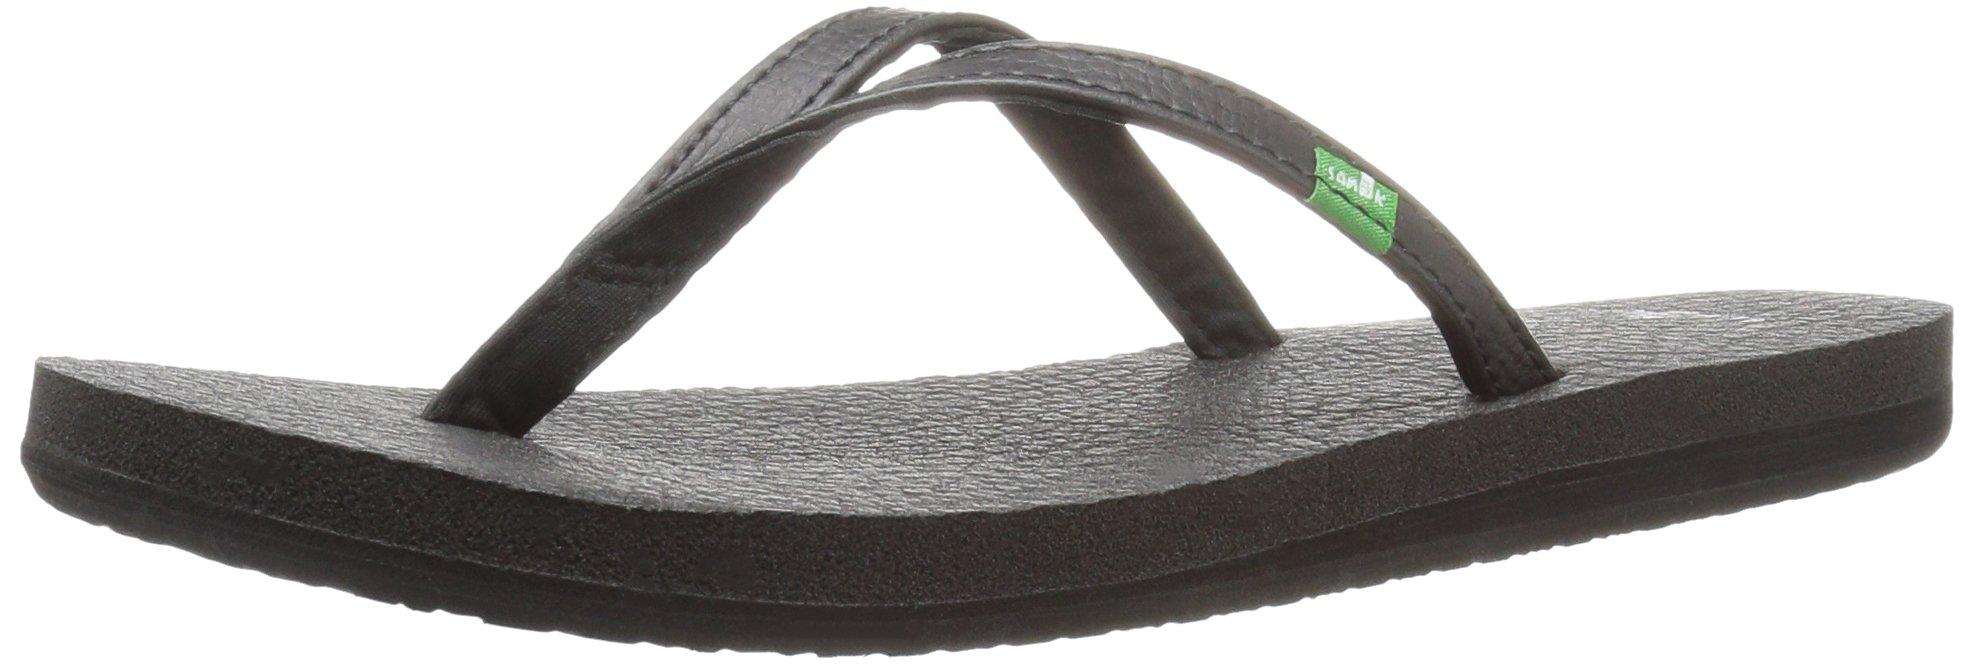 Sanuk Women's Yoga Spree 4 Flip Flop, Black, 9 M US